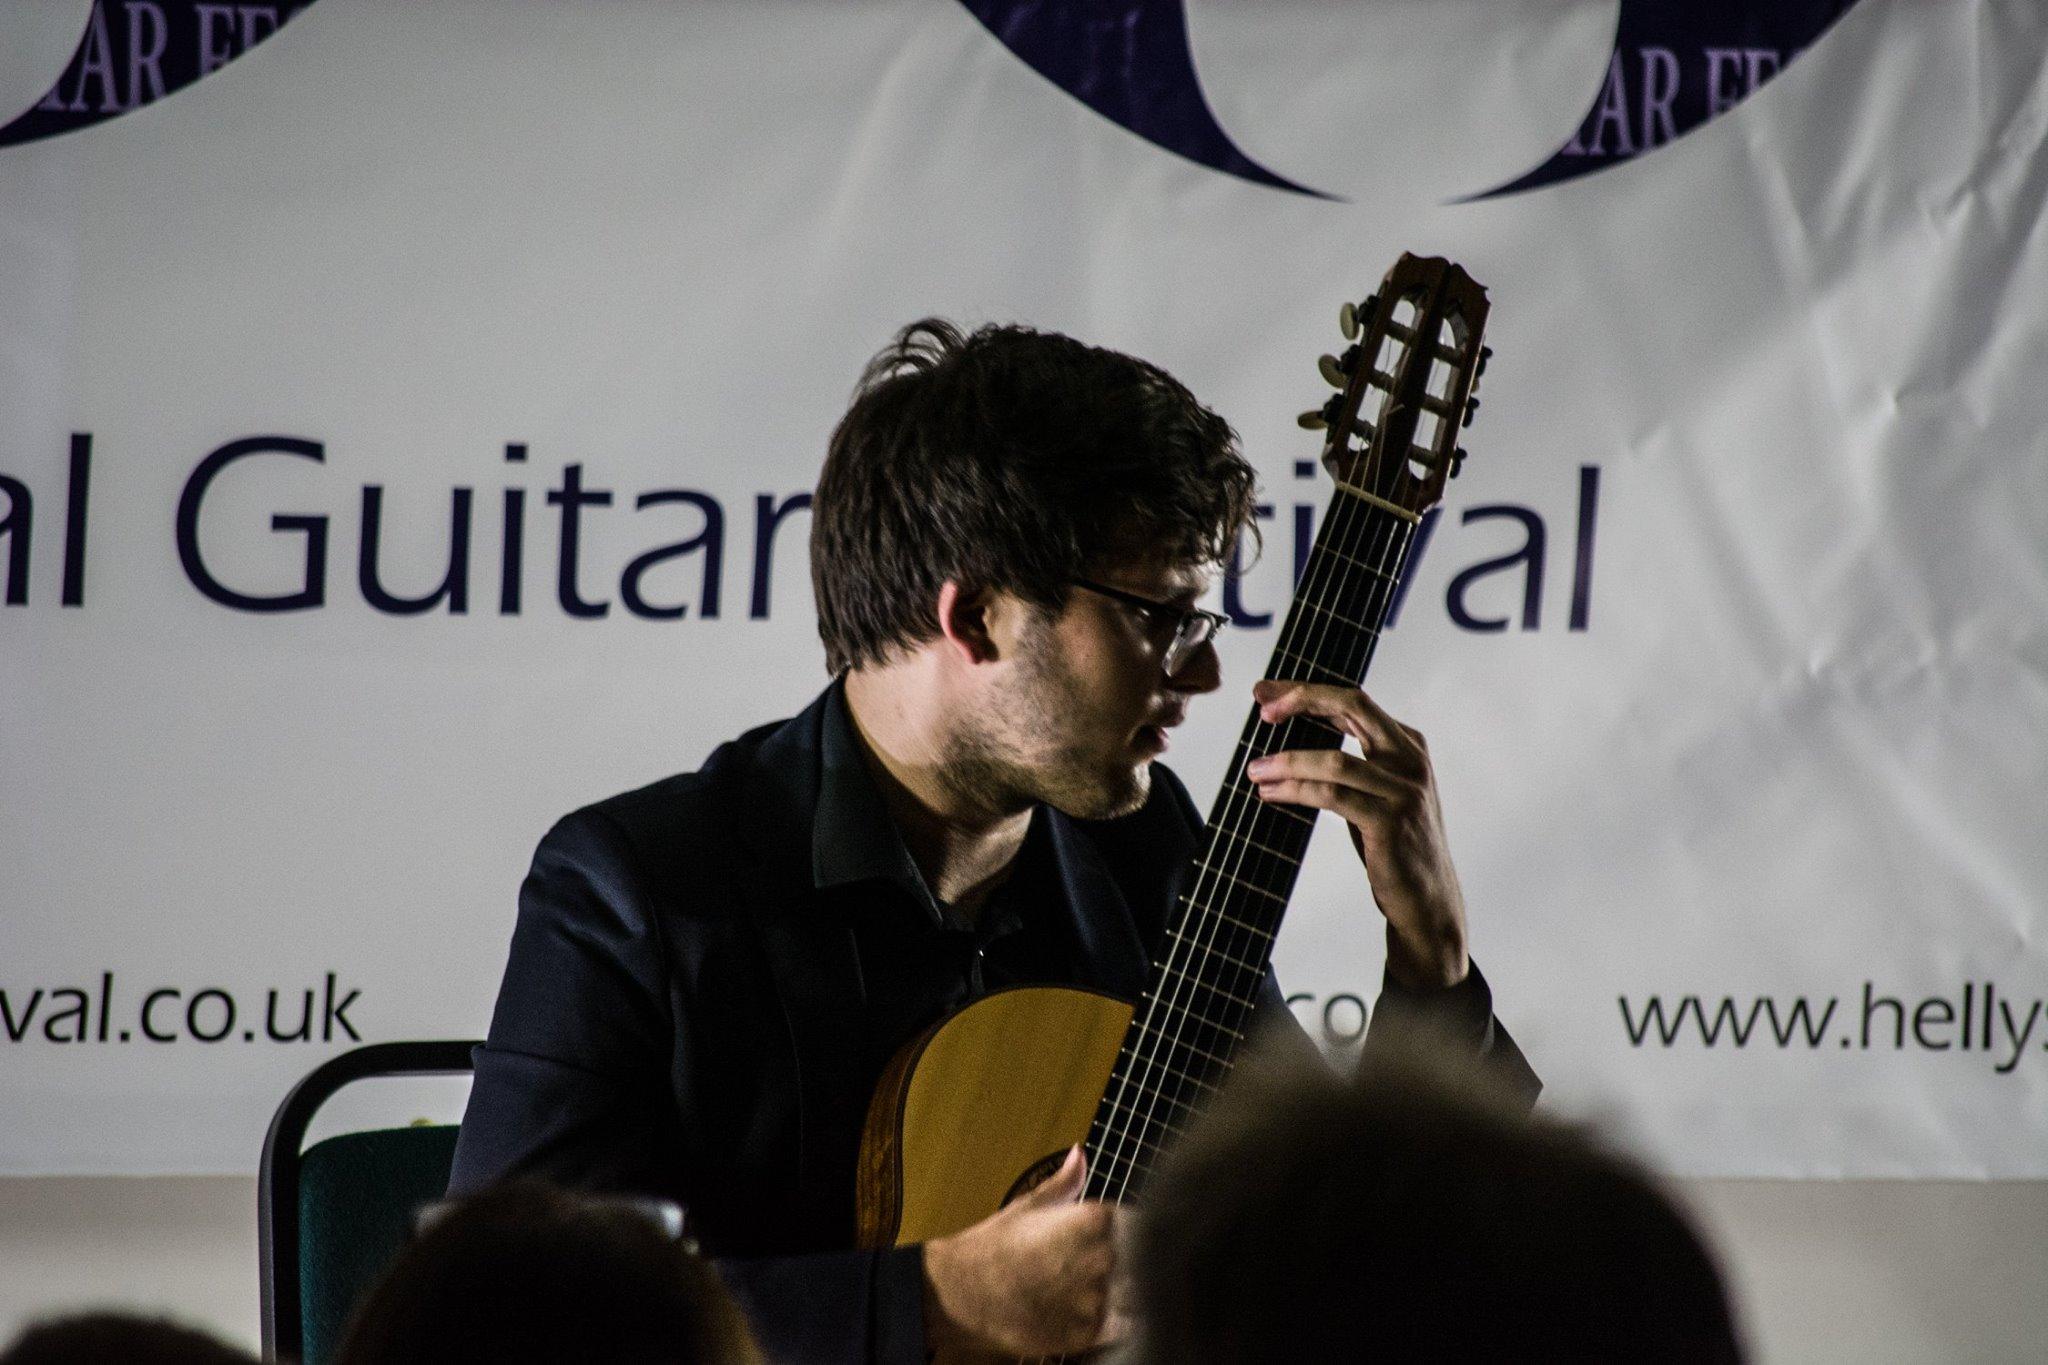 Radek Wieczorek in concert at Hellys Guitar Festival